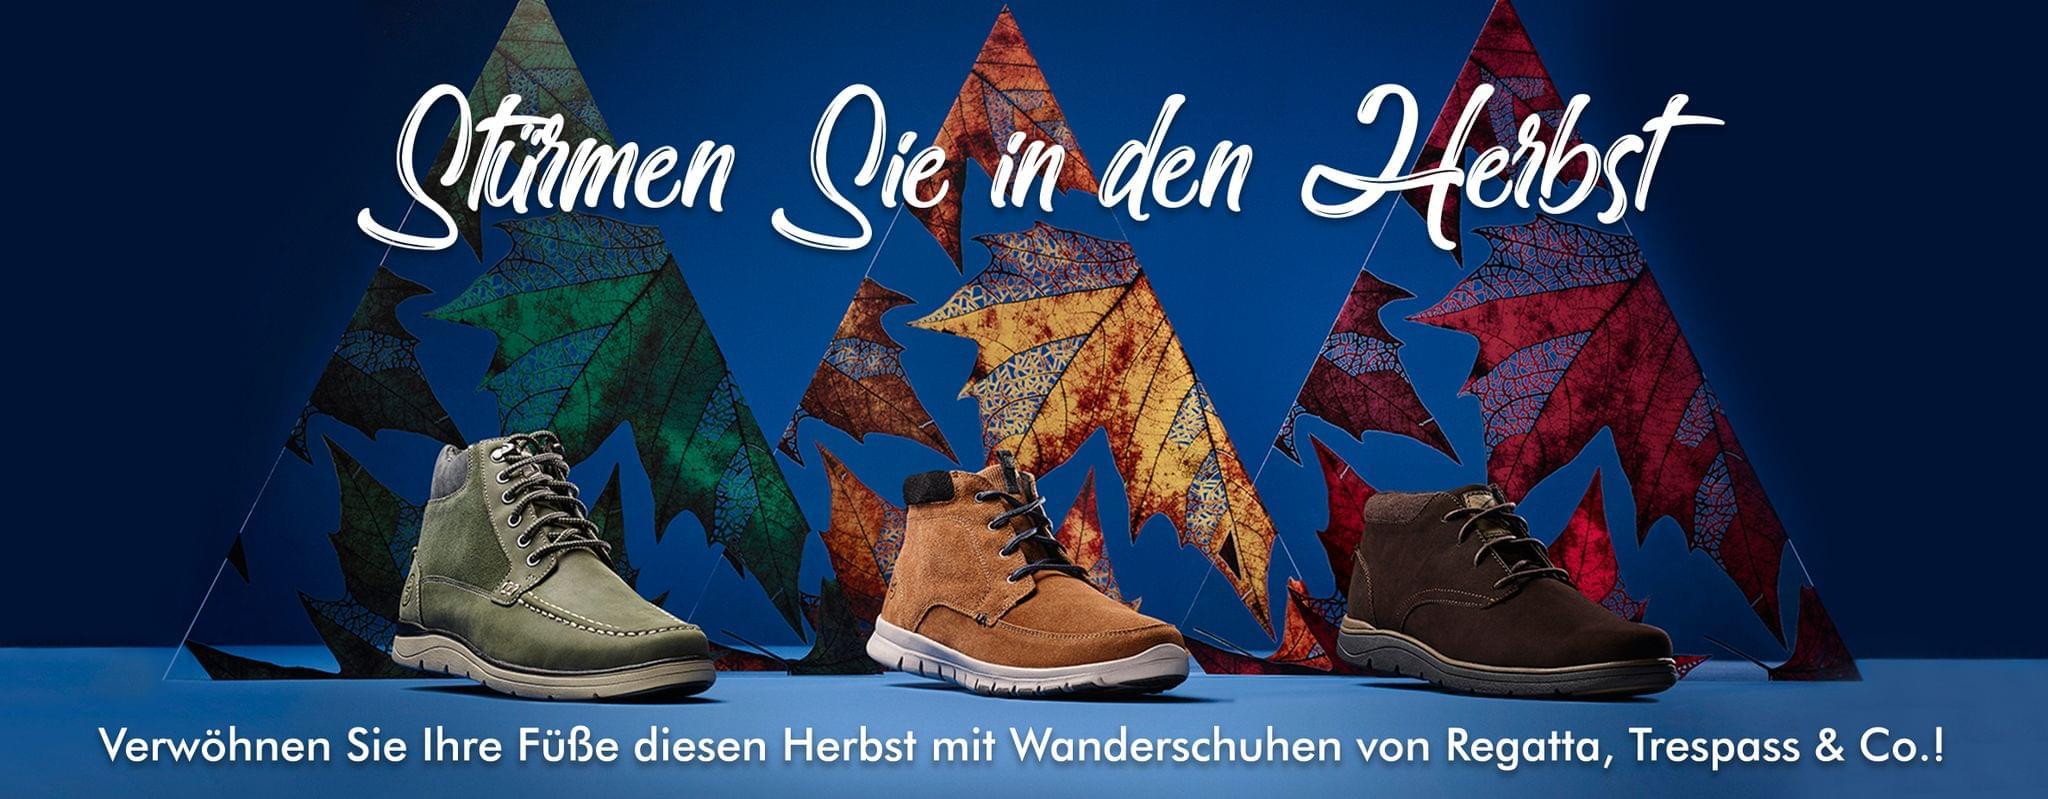 Deutsche Wanderschuhe